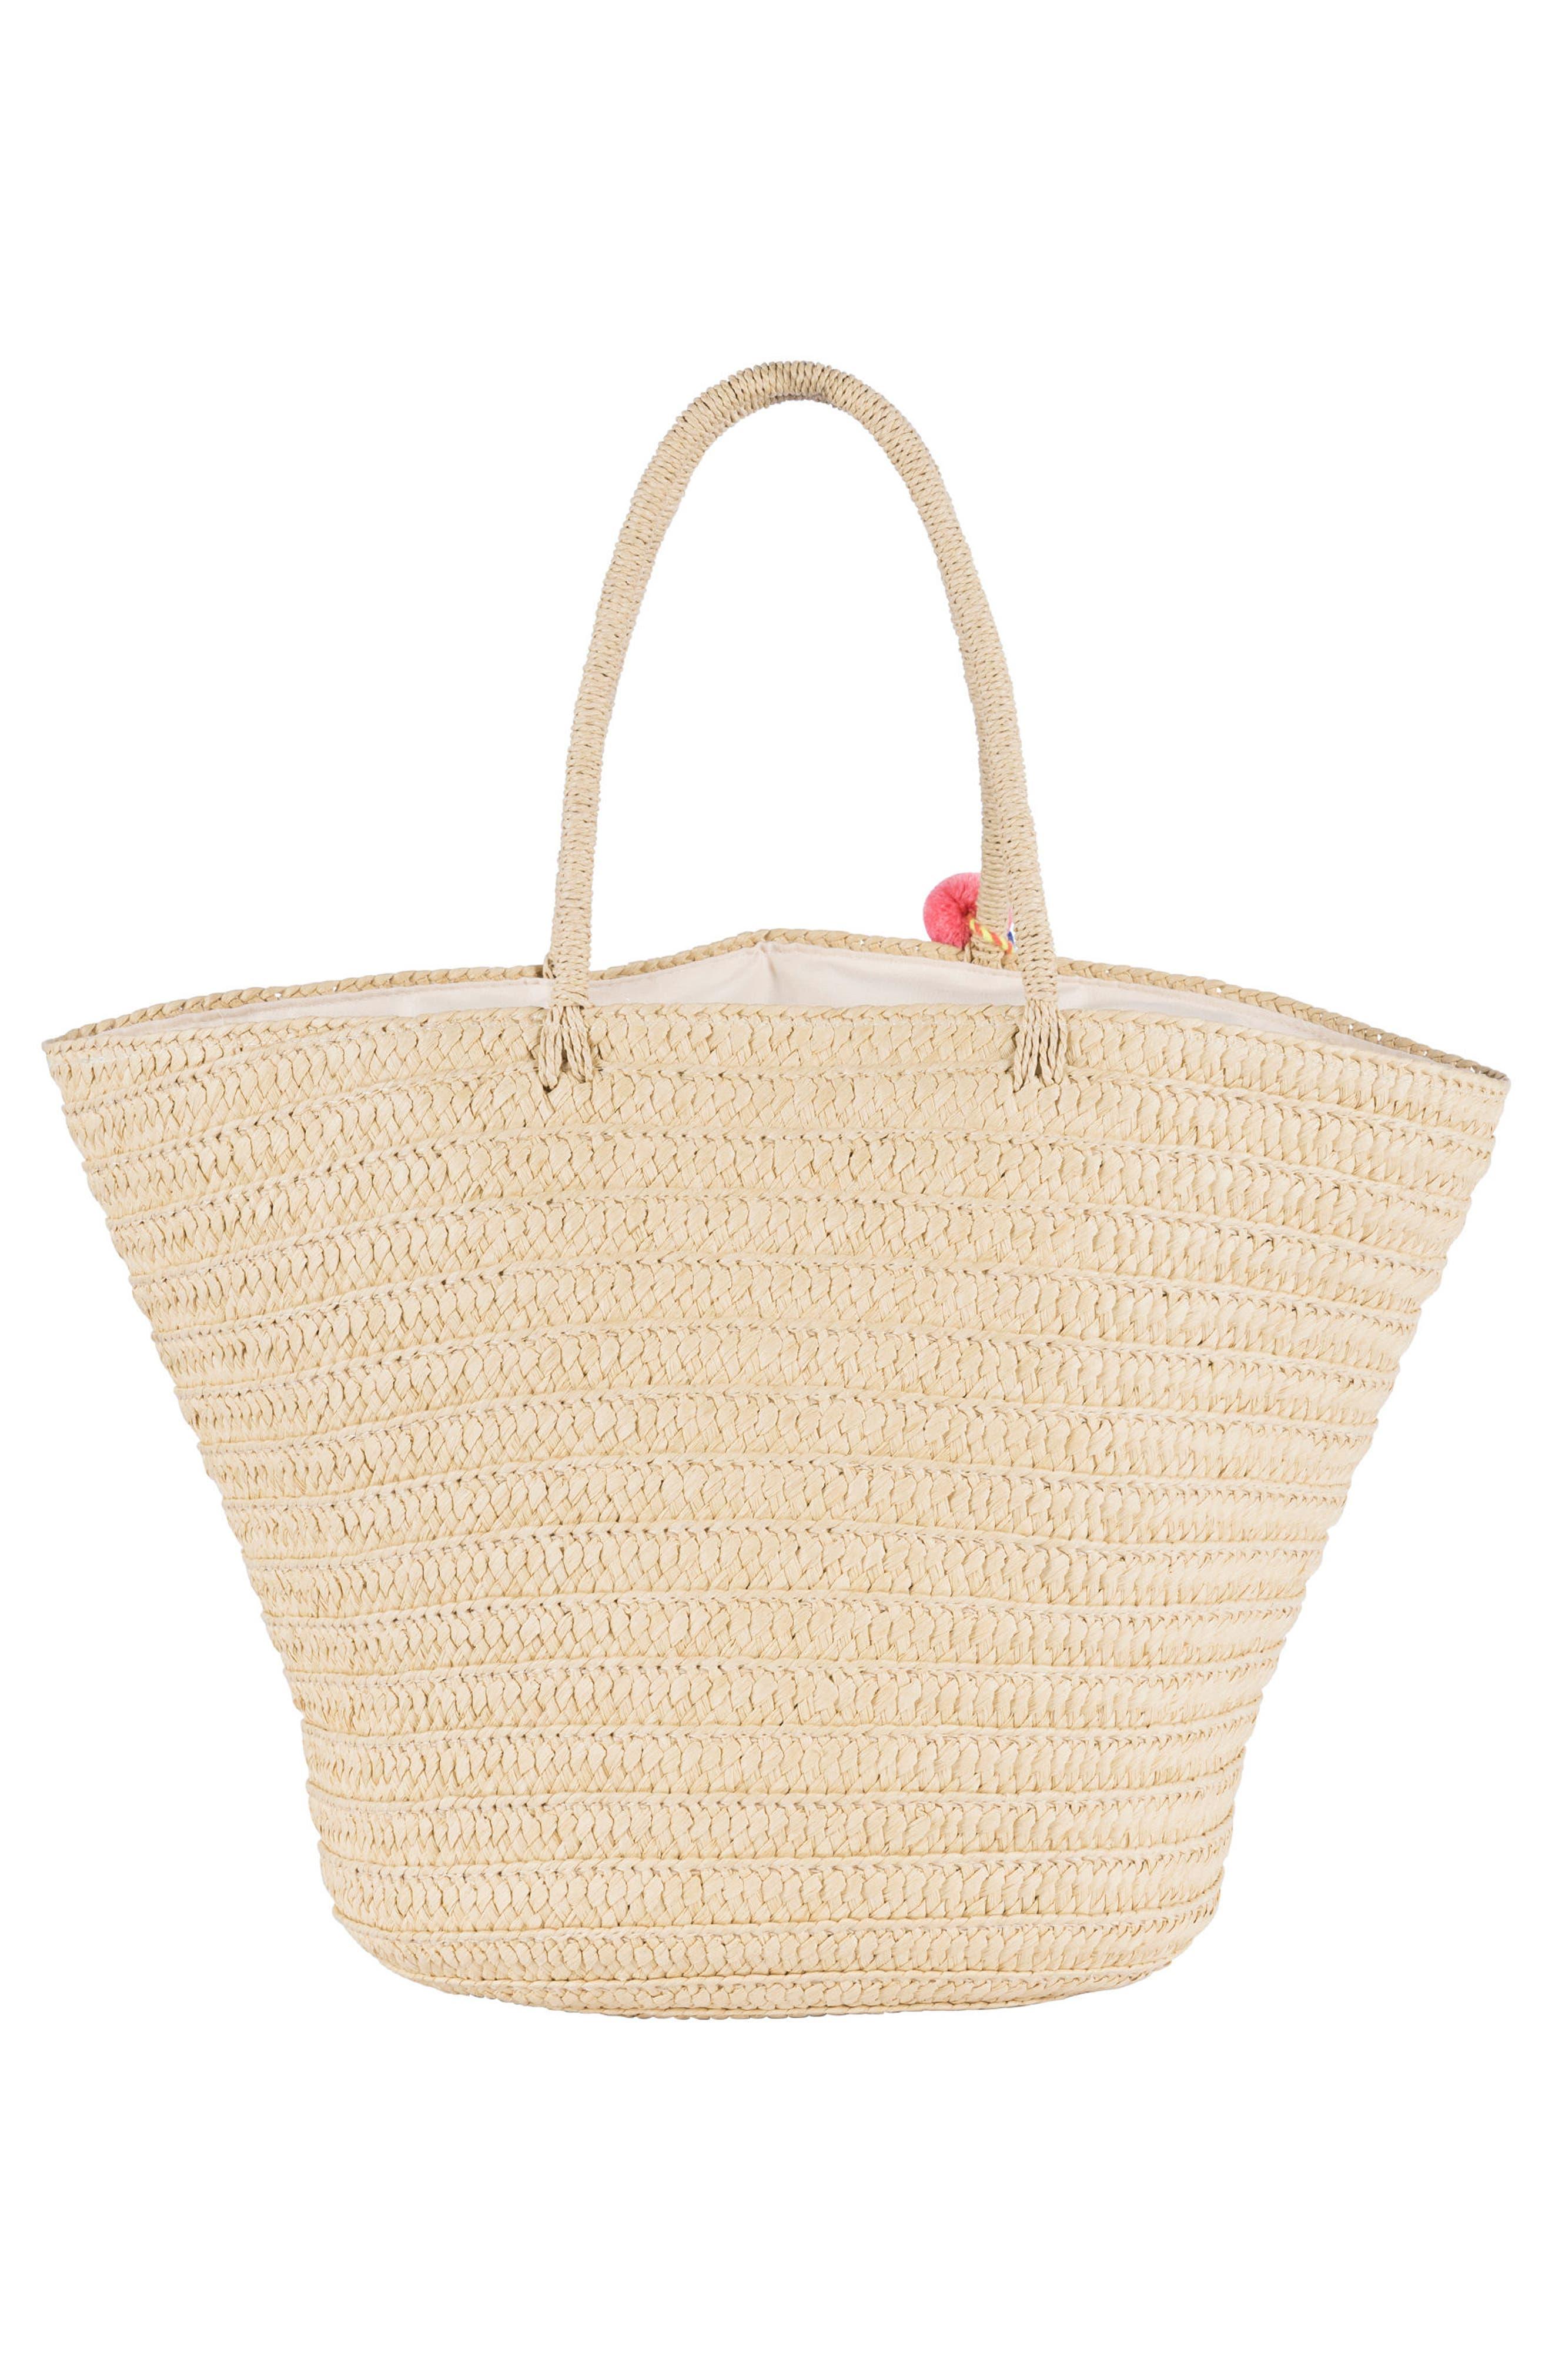 Beach Bazaar Straw Bag,                             Alternate thumbnail 4, color,                             Natural